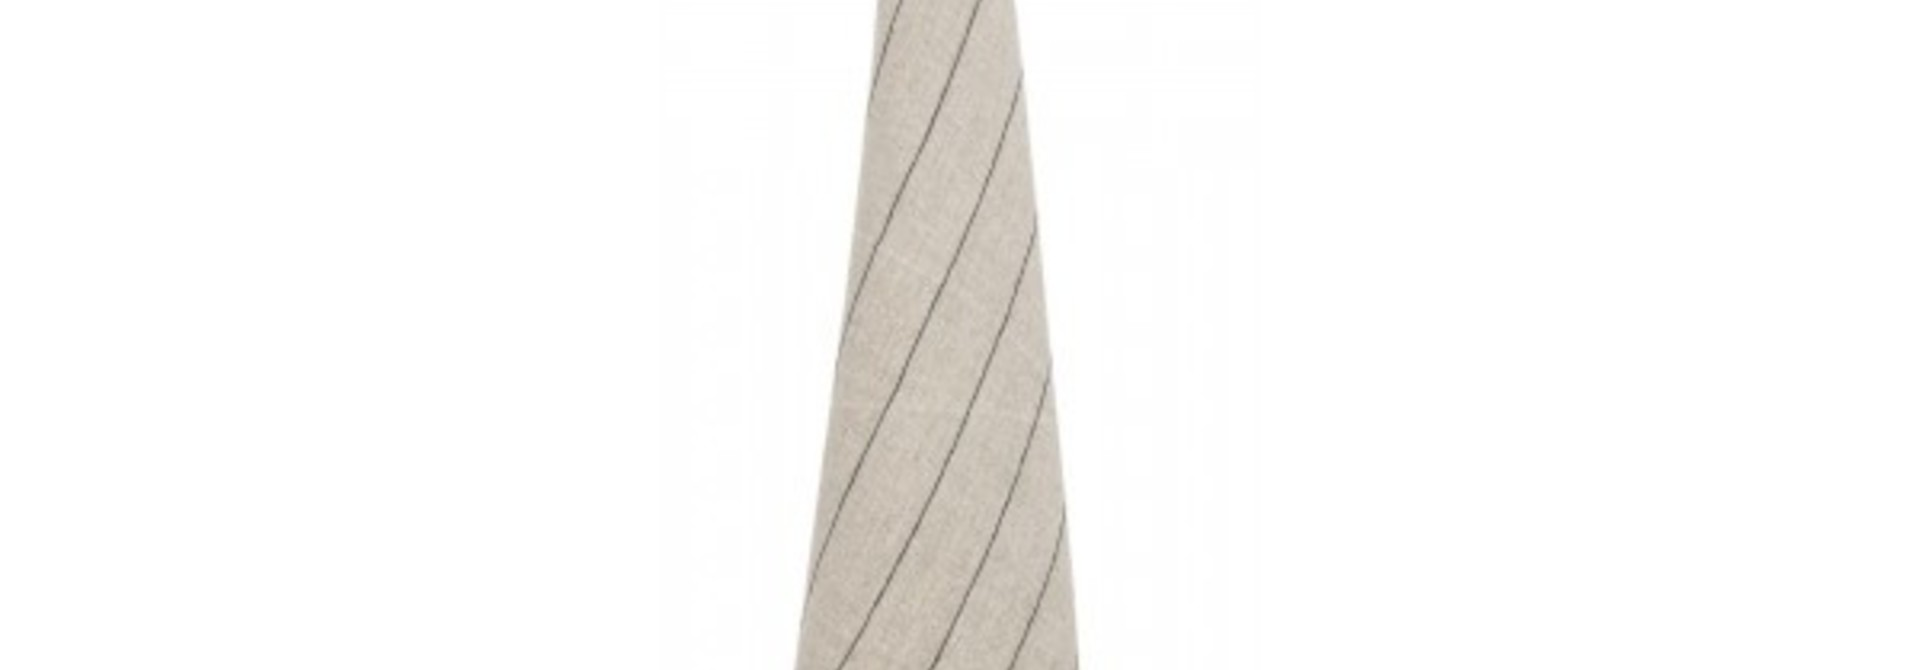 Tea-Towel - Calvi - Natural w/stripe